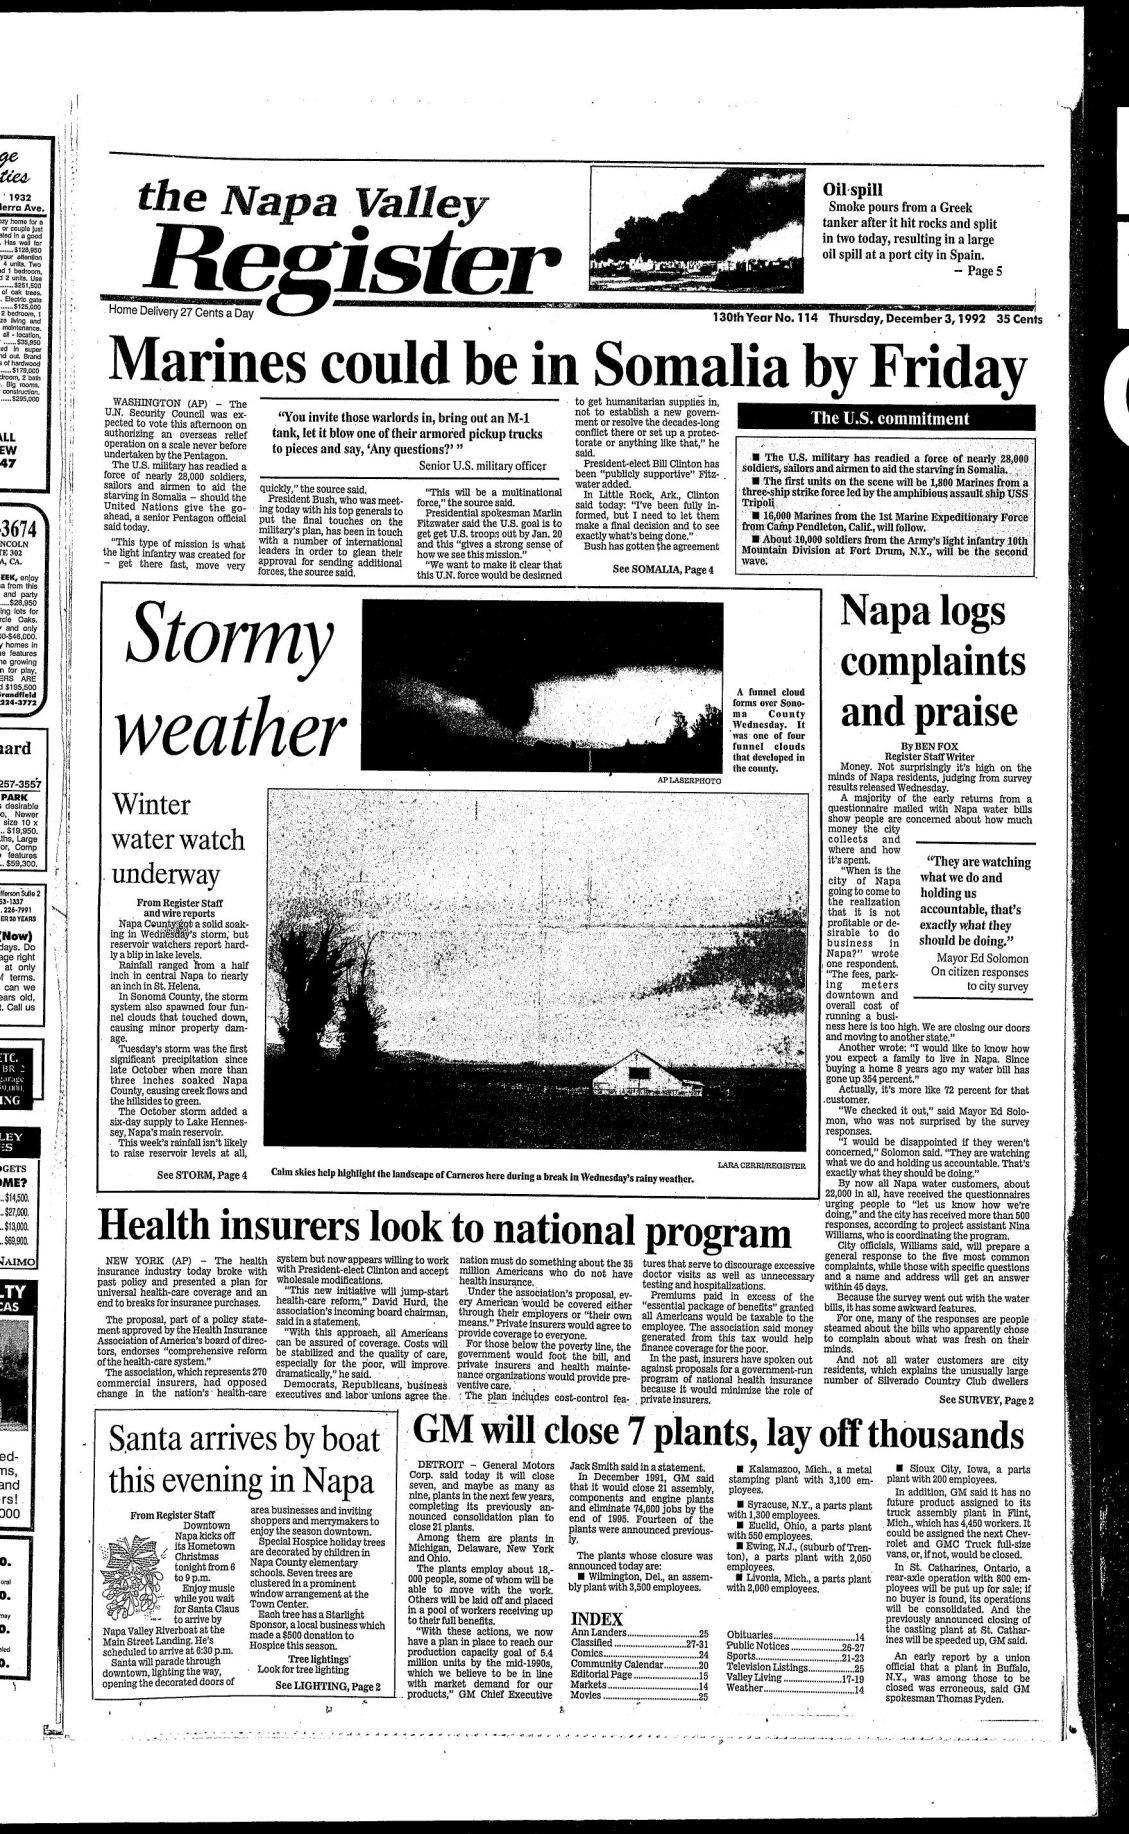 Dec. 3, 1992